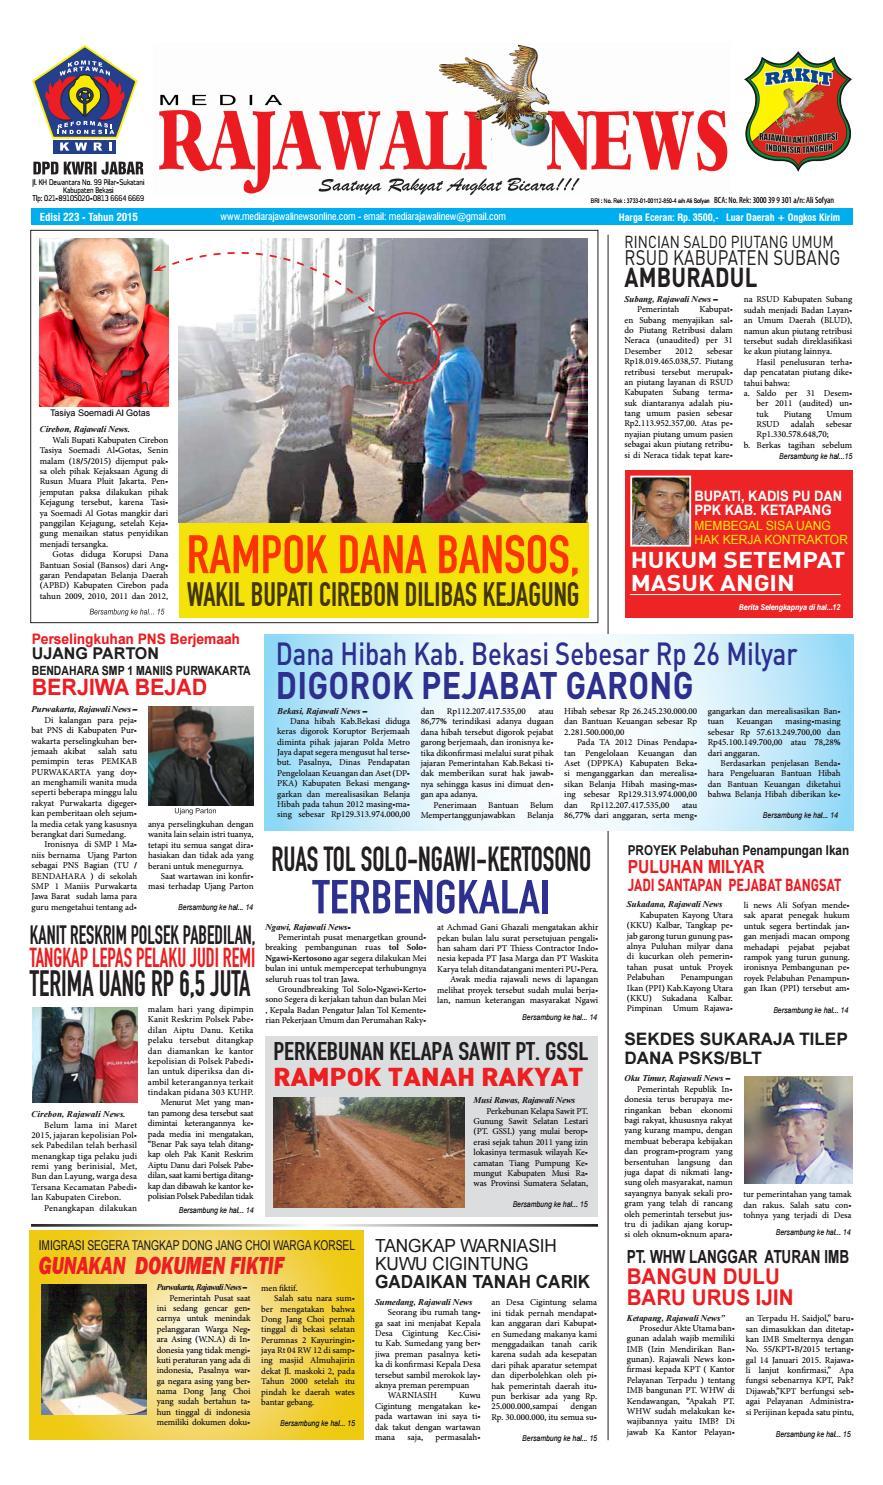 Blog Posts Stafftracker Rkb Bni Tegal Kranjang Buah Nur Fashion And Art Robert Hendra Genting Ap Msi Computers